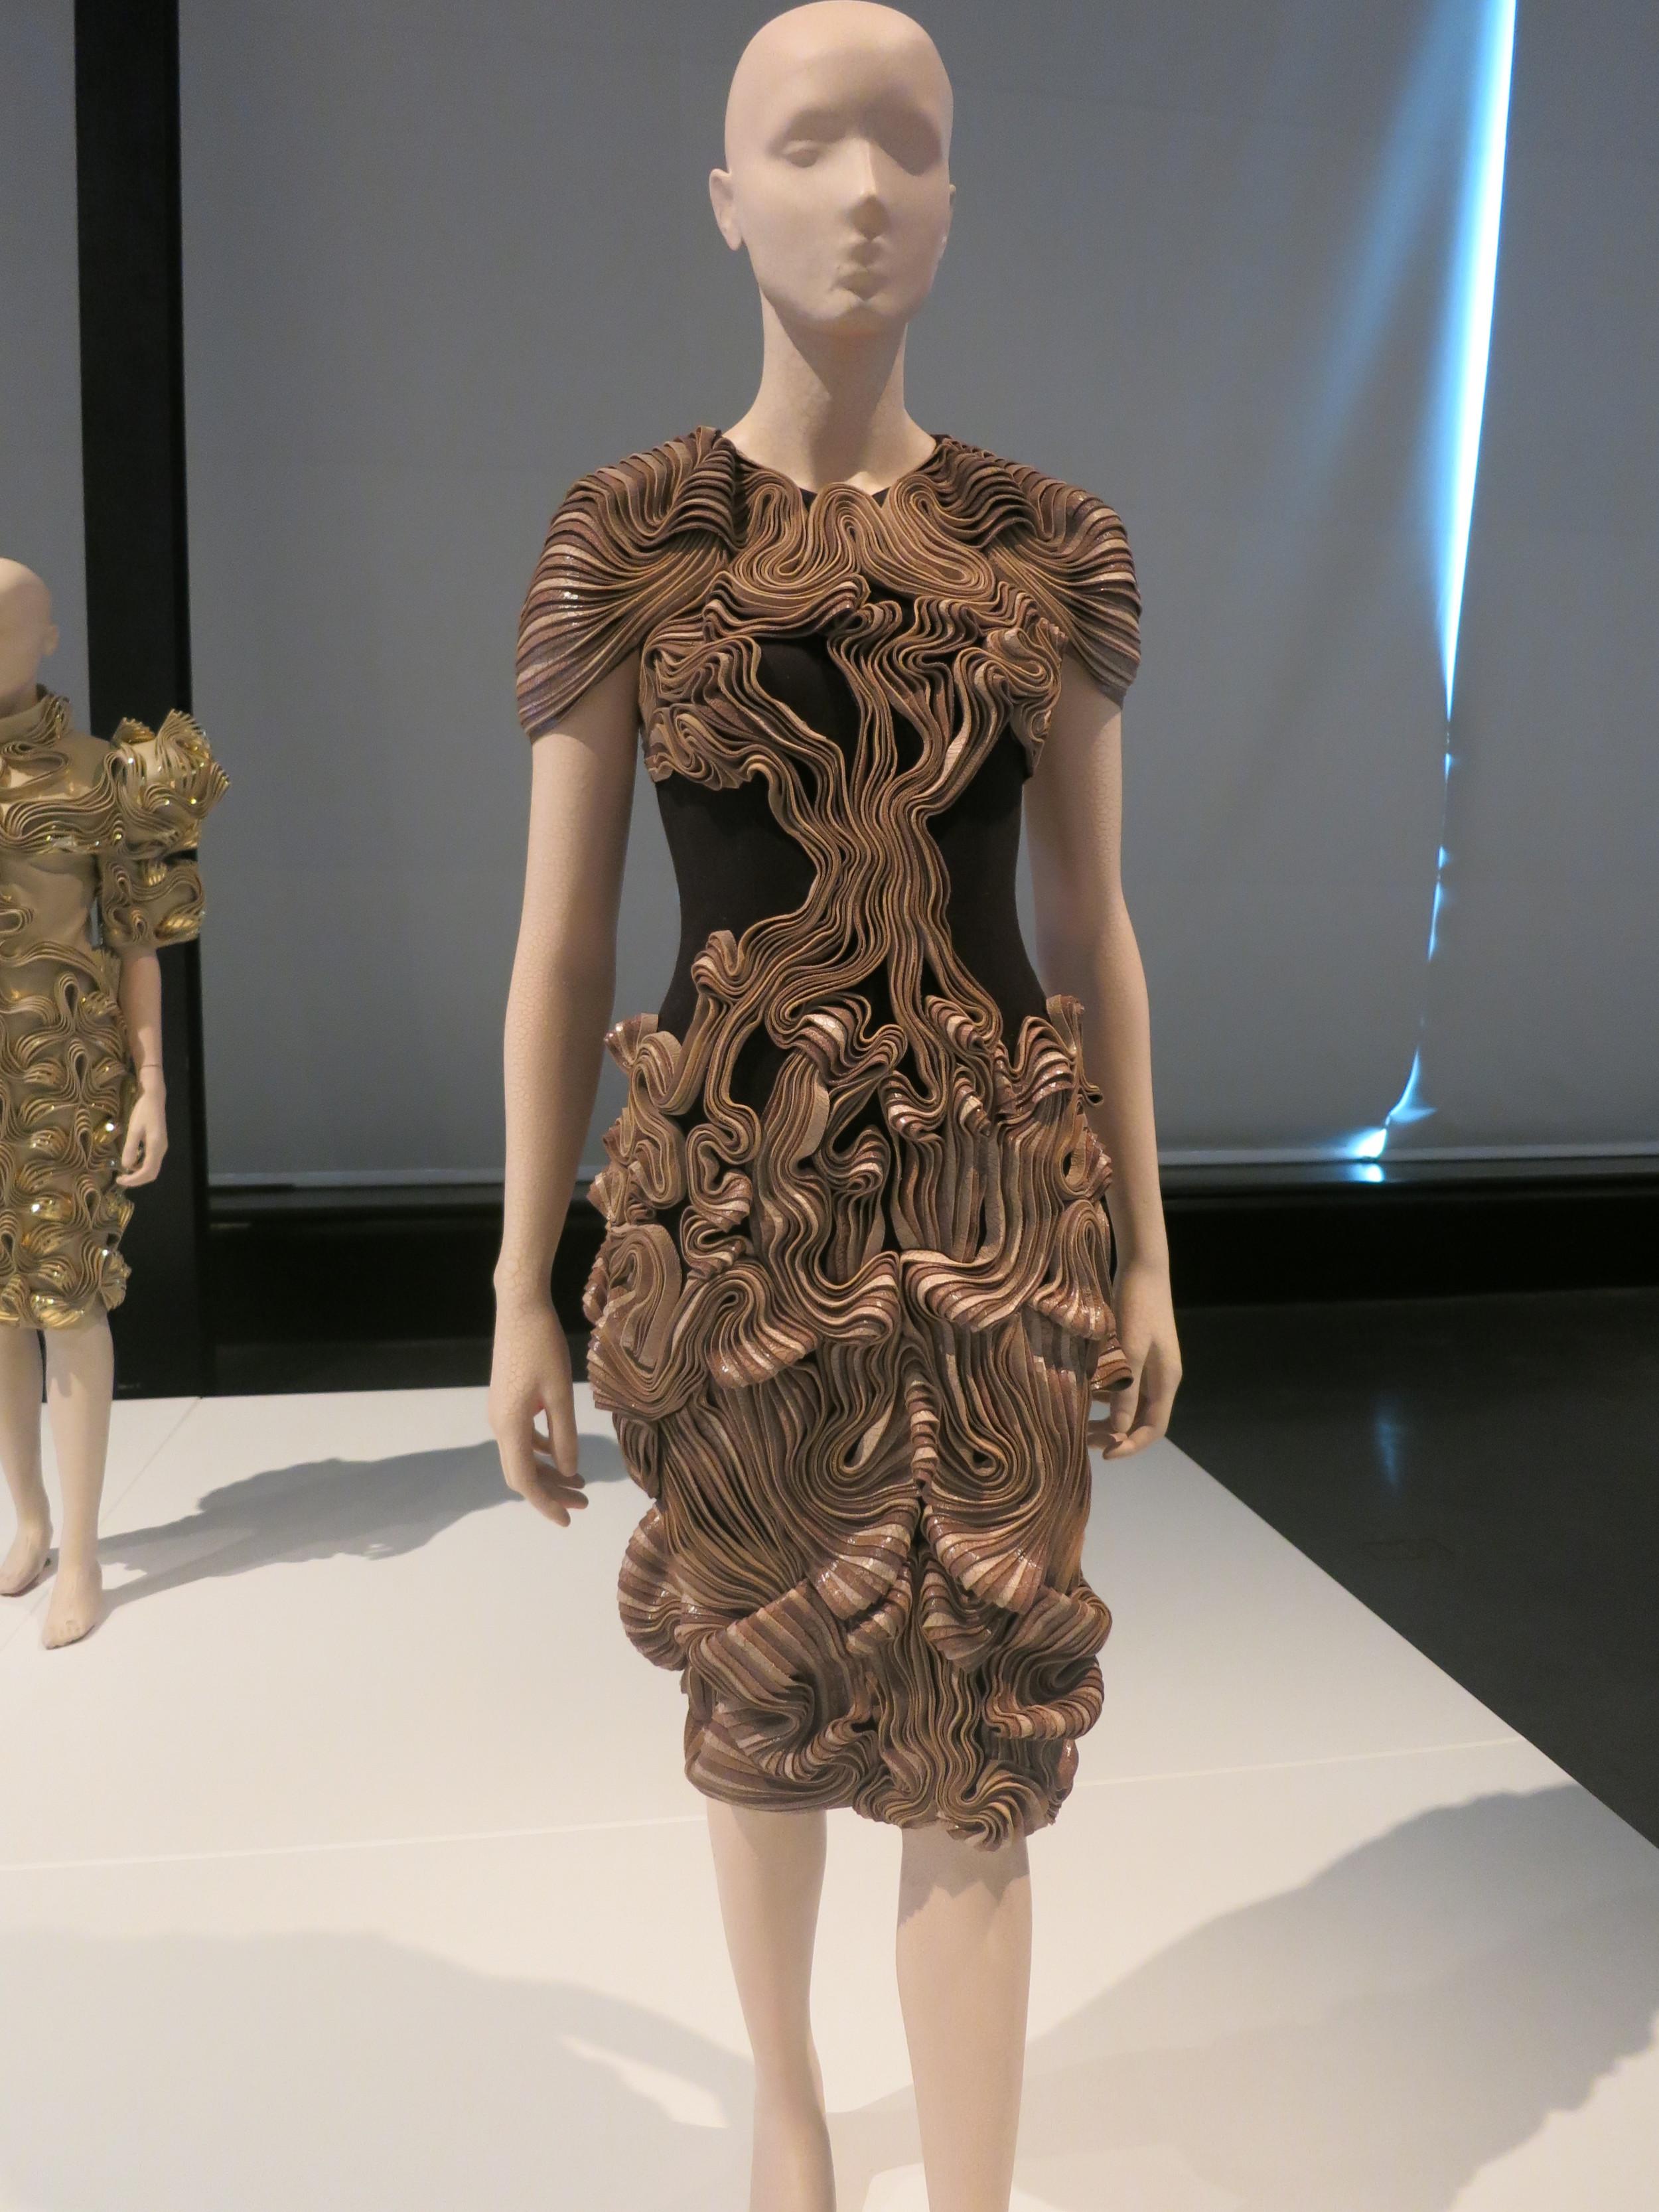 Iris van Herpen exhibition at Calais Lace Museum 2013 - 'RADIATION INVASION' 2009